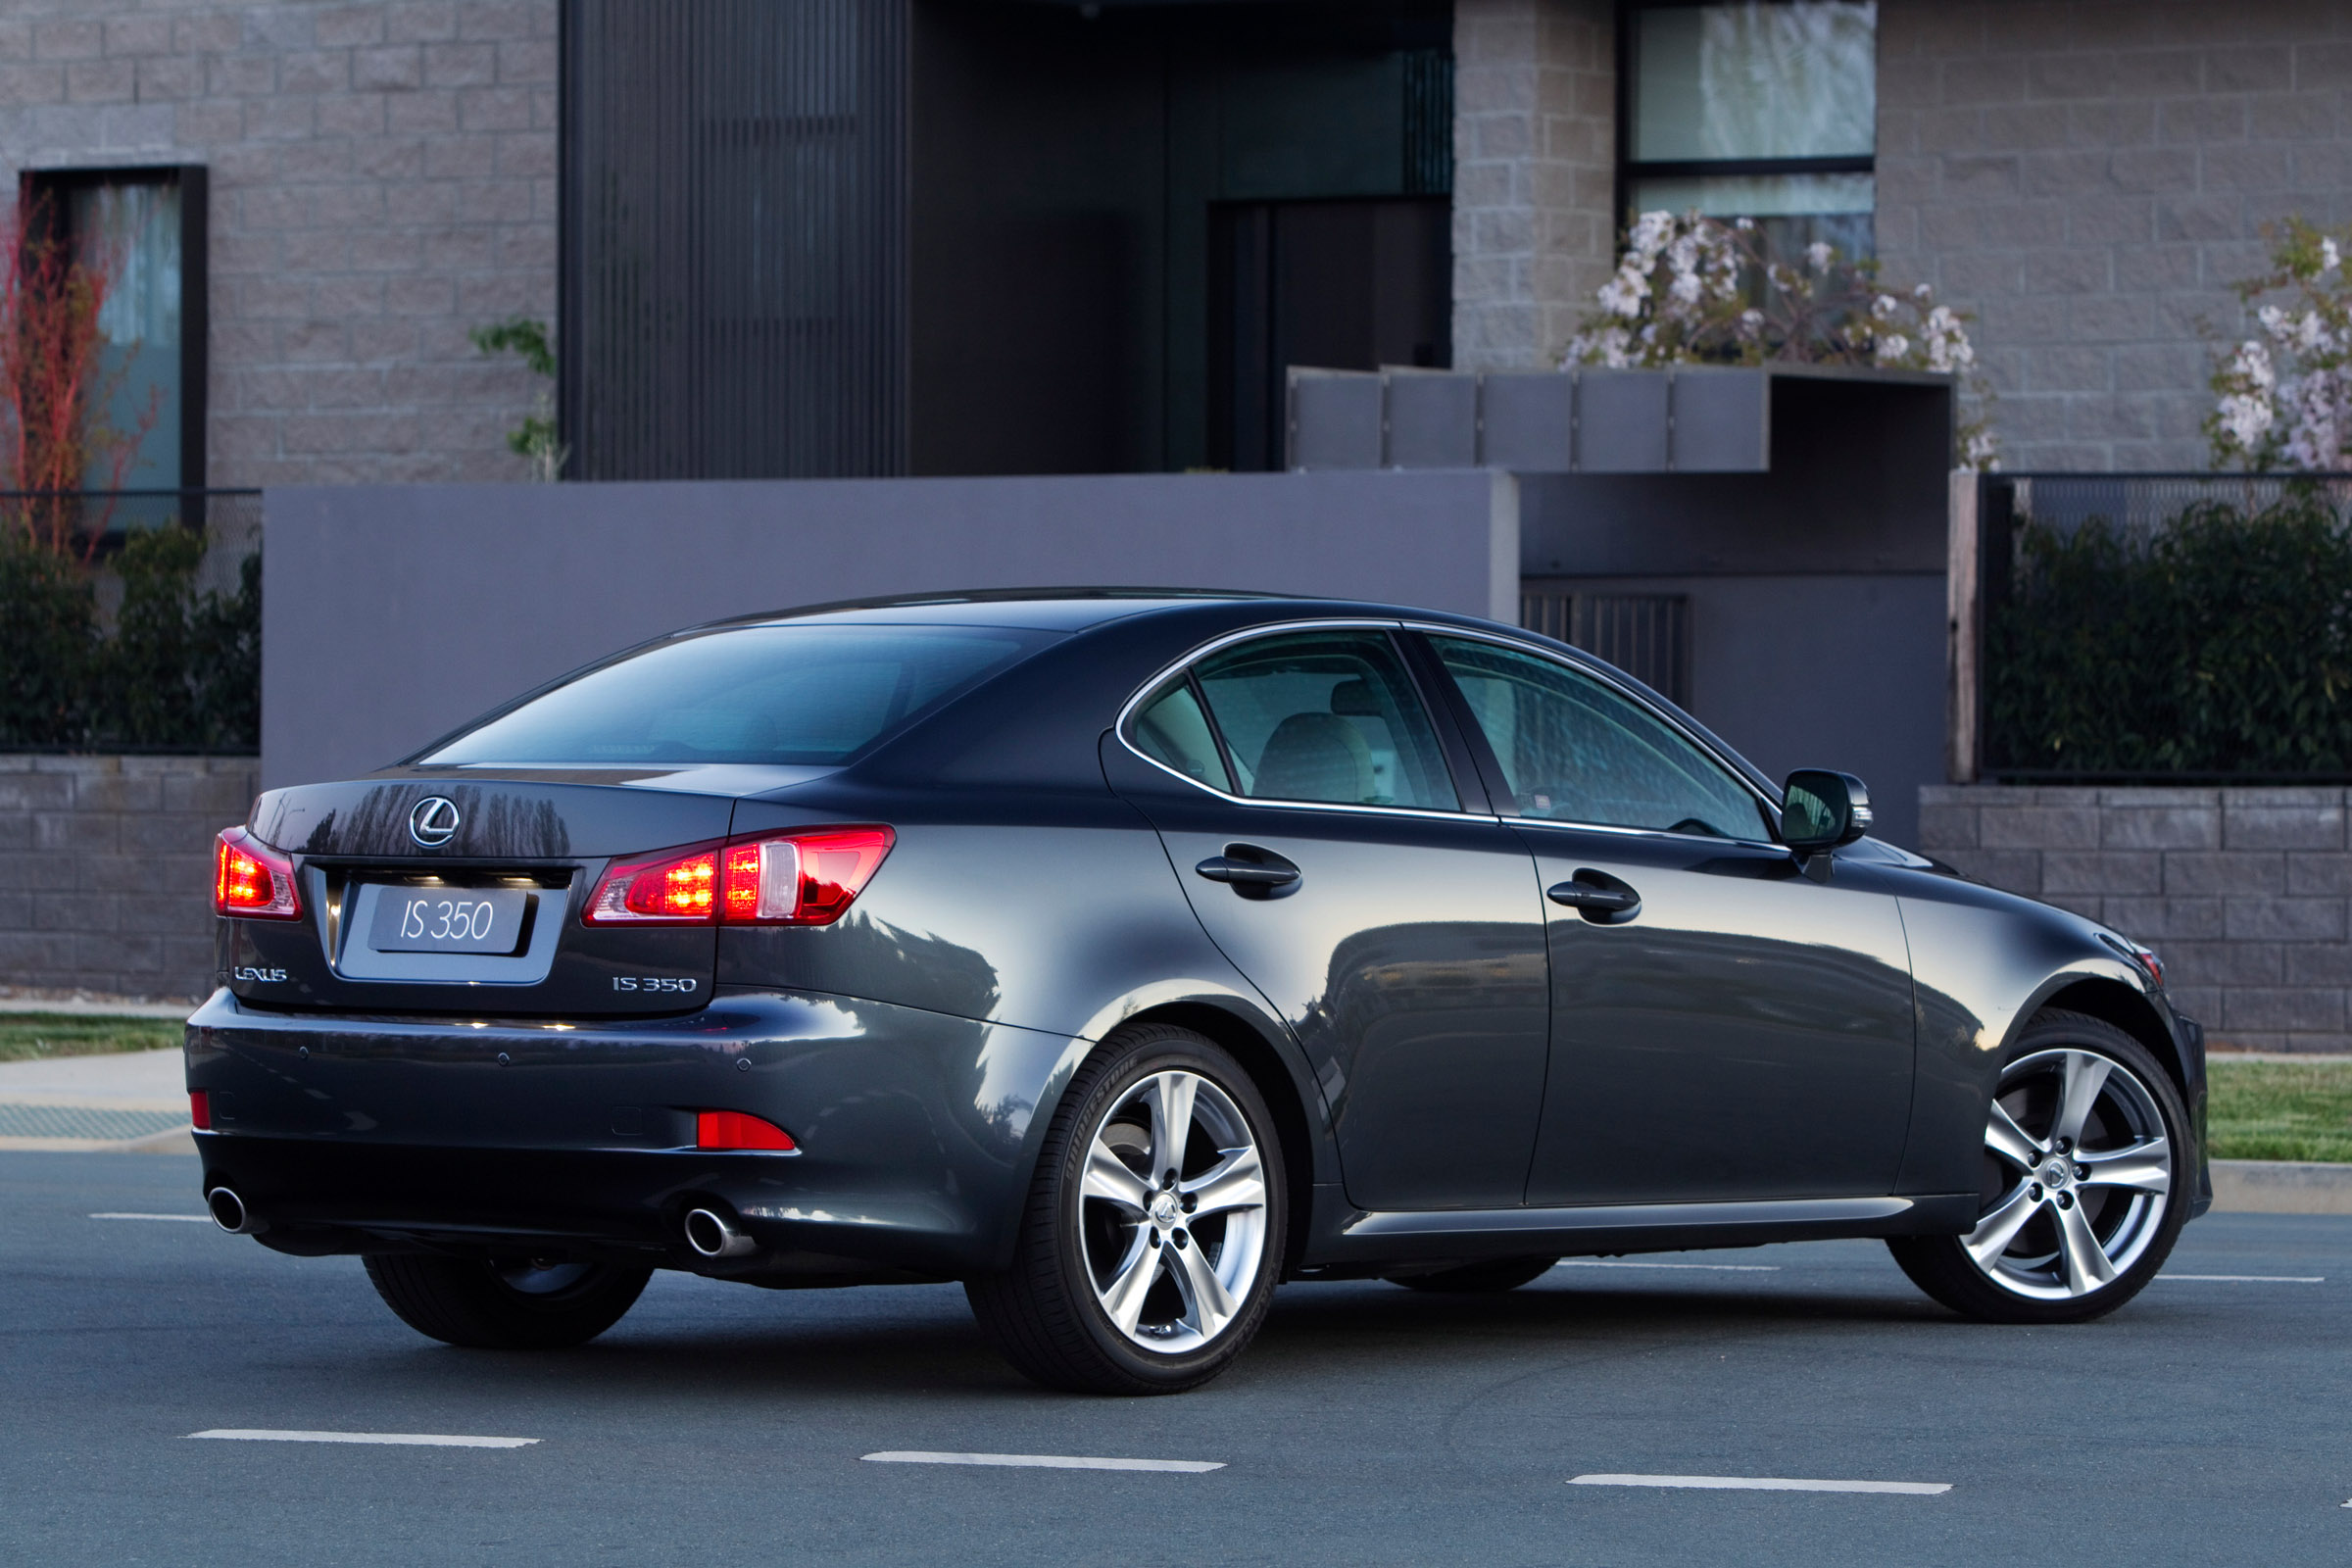 Lexus Is 350 Sedan Debuts On The Australian Market